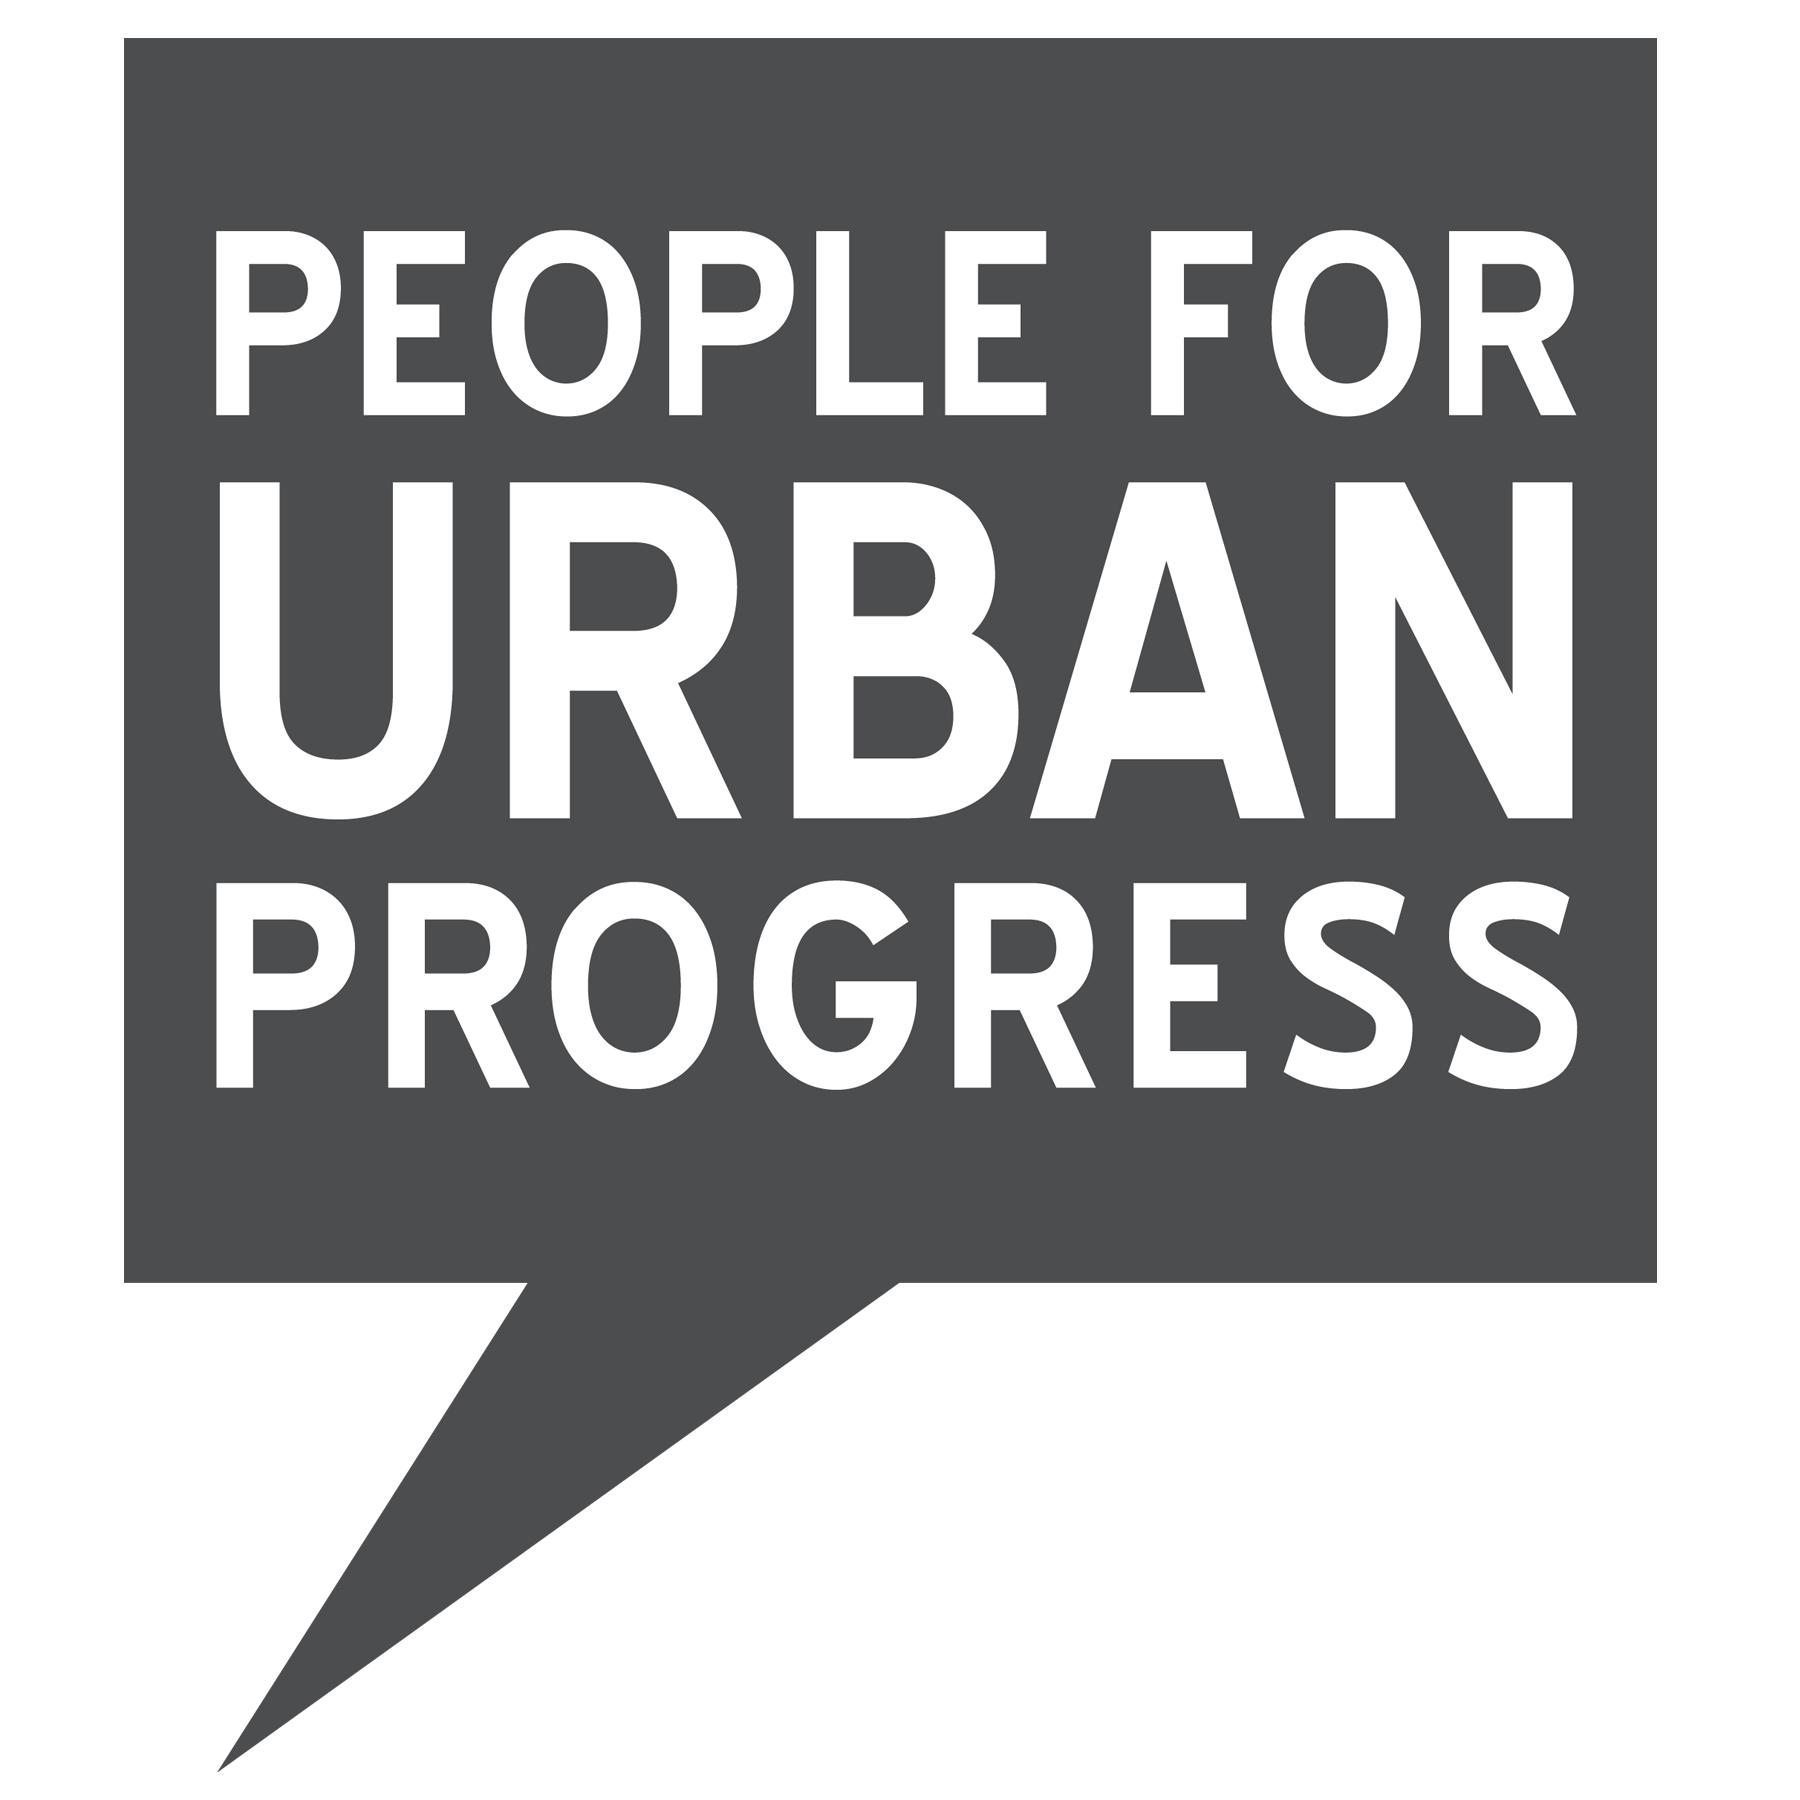 People for Urban Progress